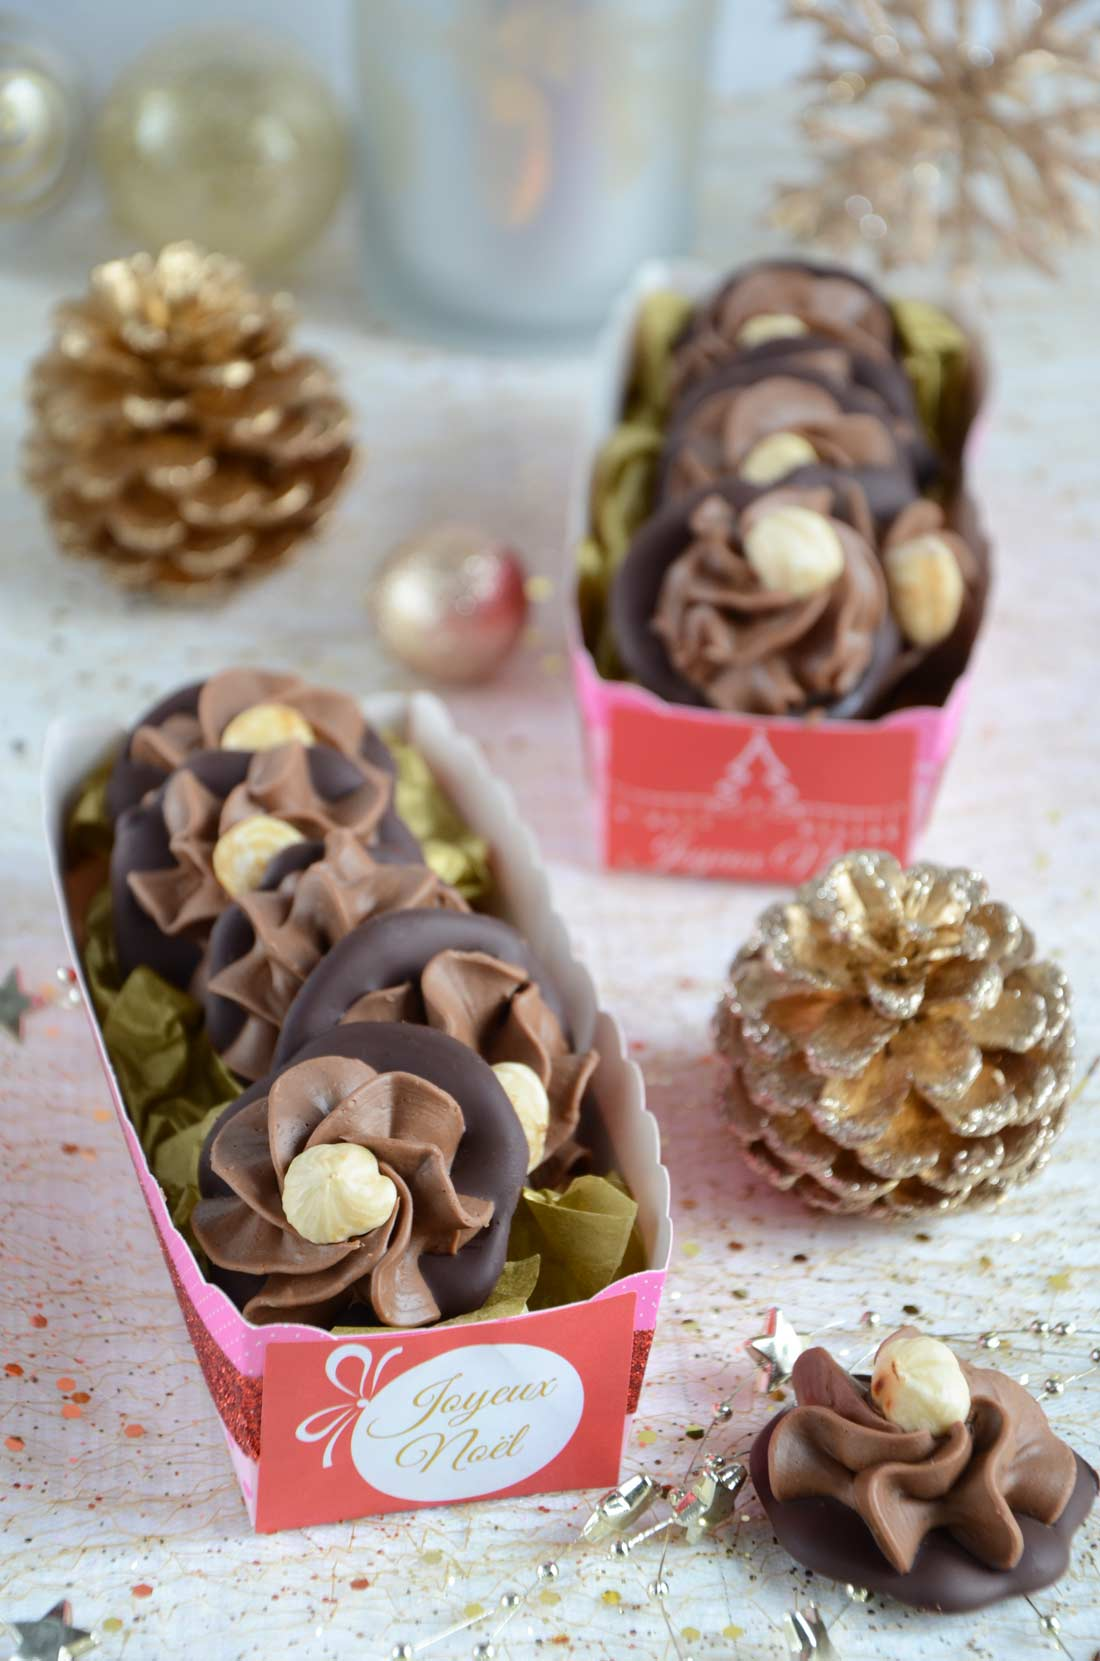 Chocolats gianduja fait maison